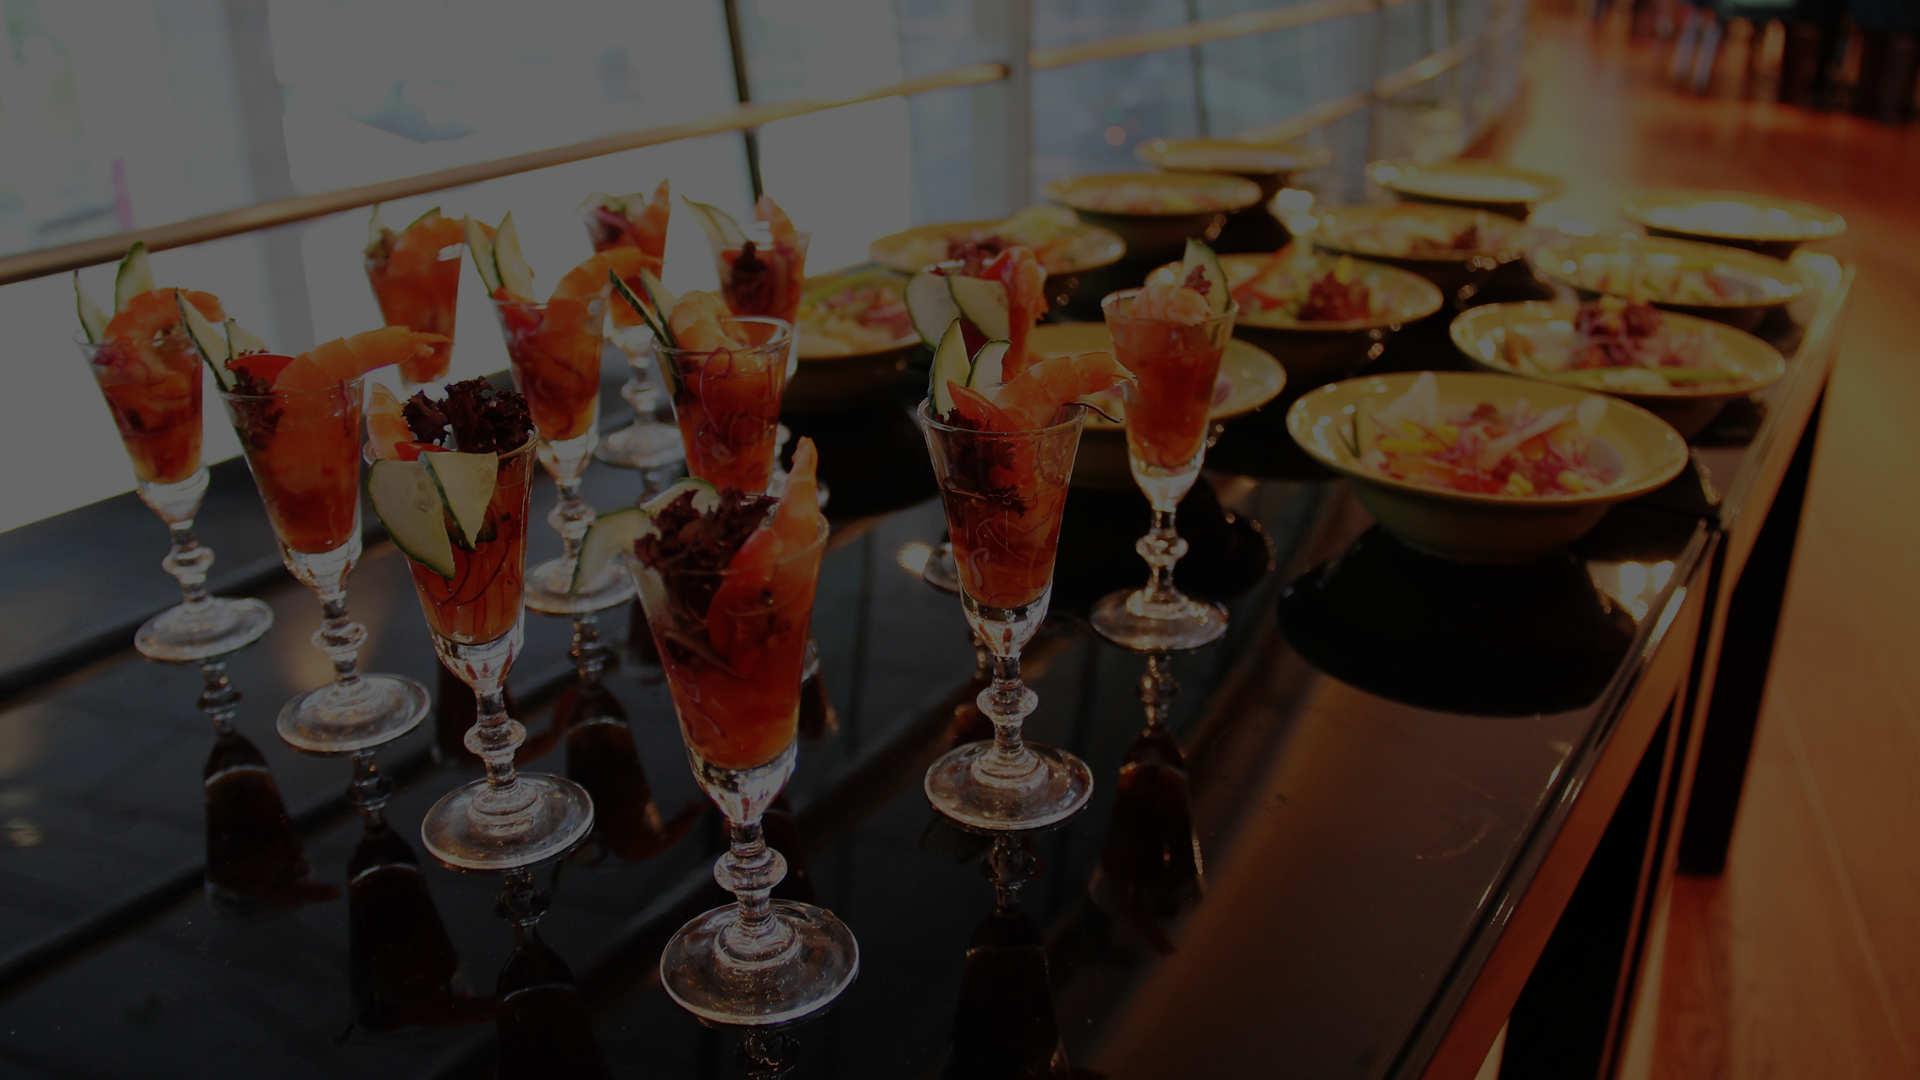 culinaria-partyservice-augsburg-01